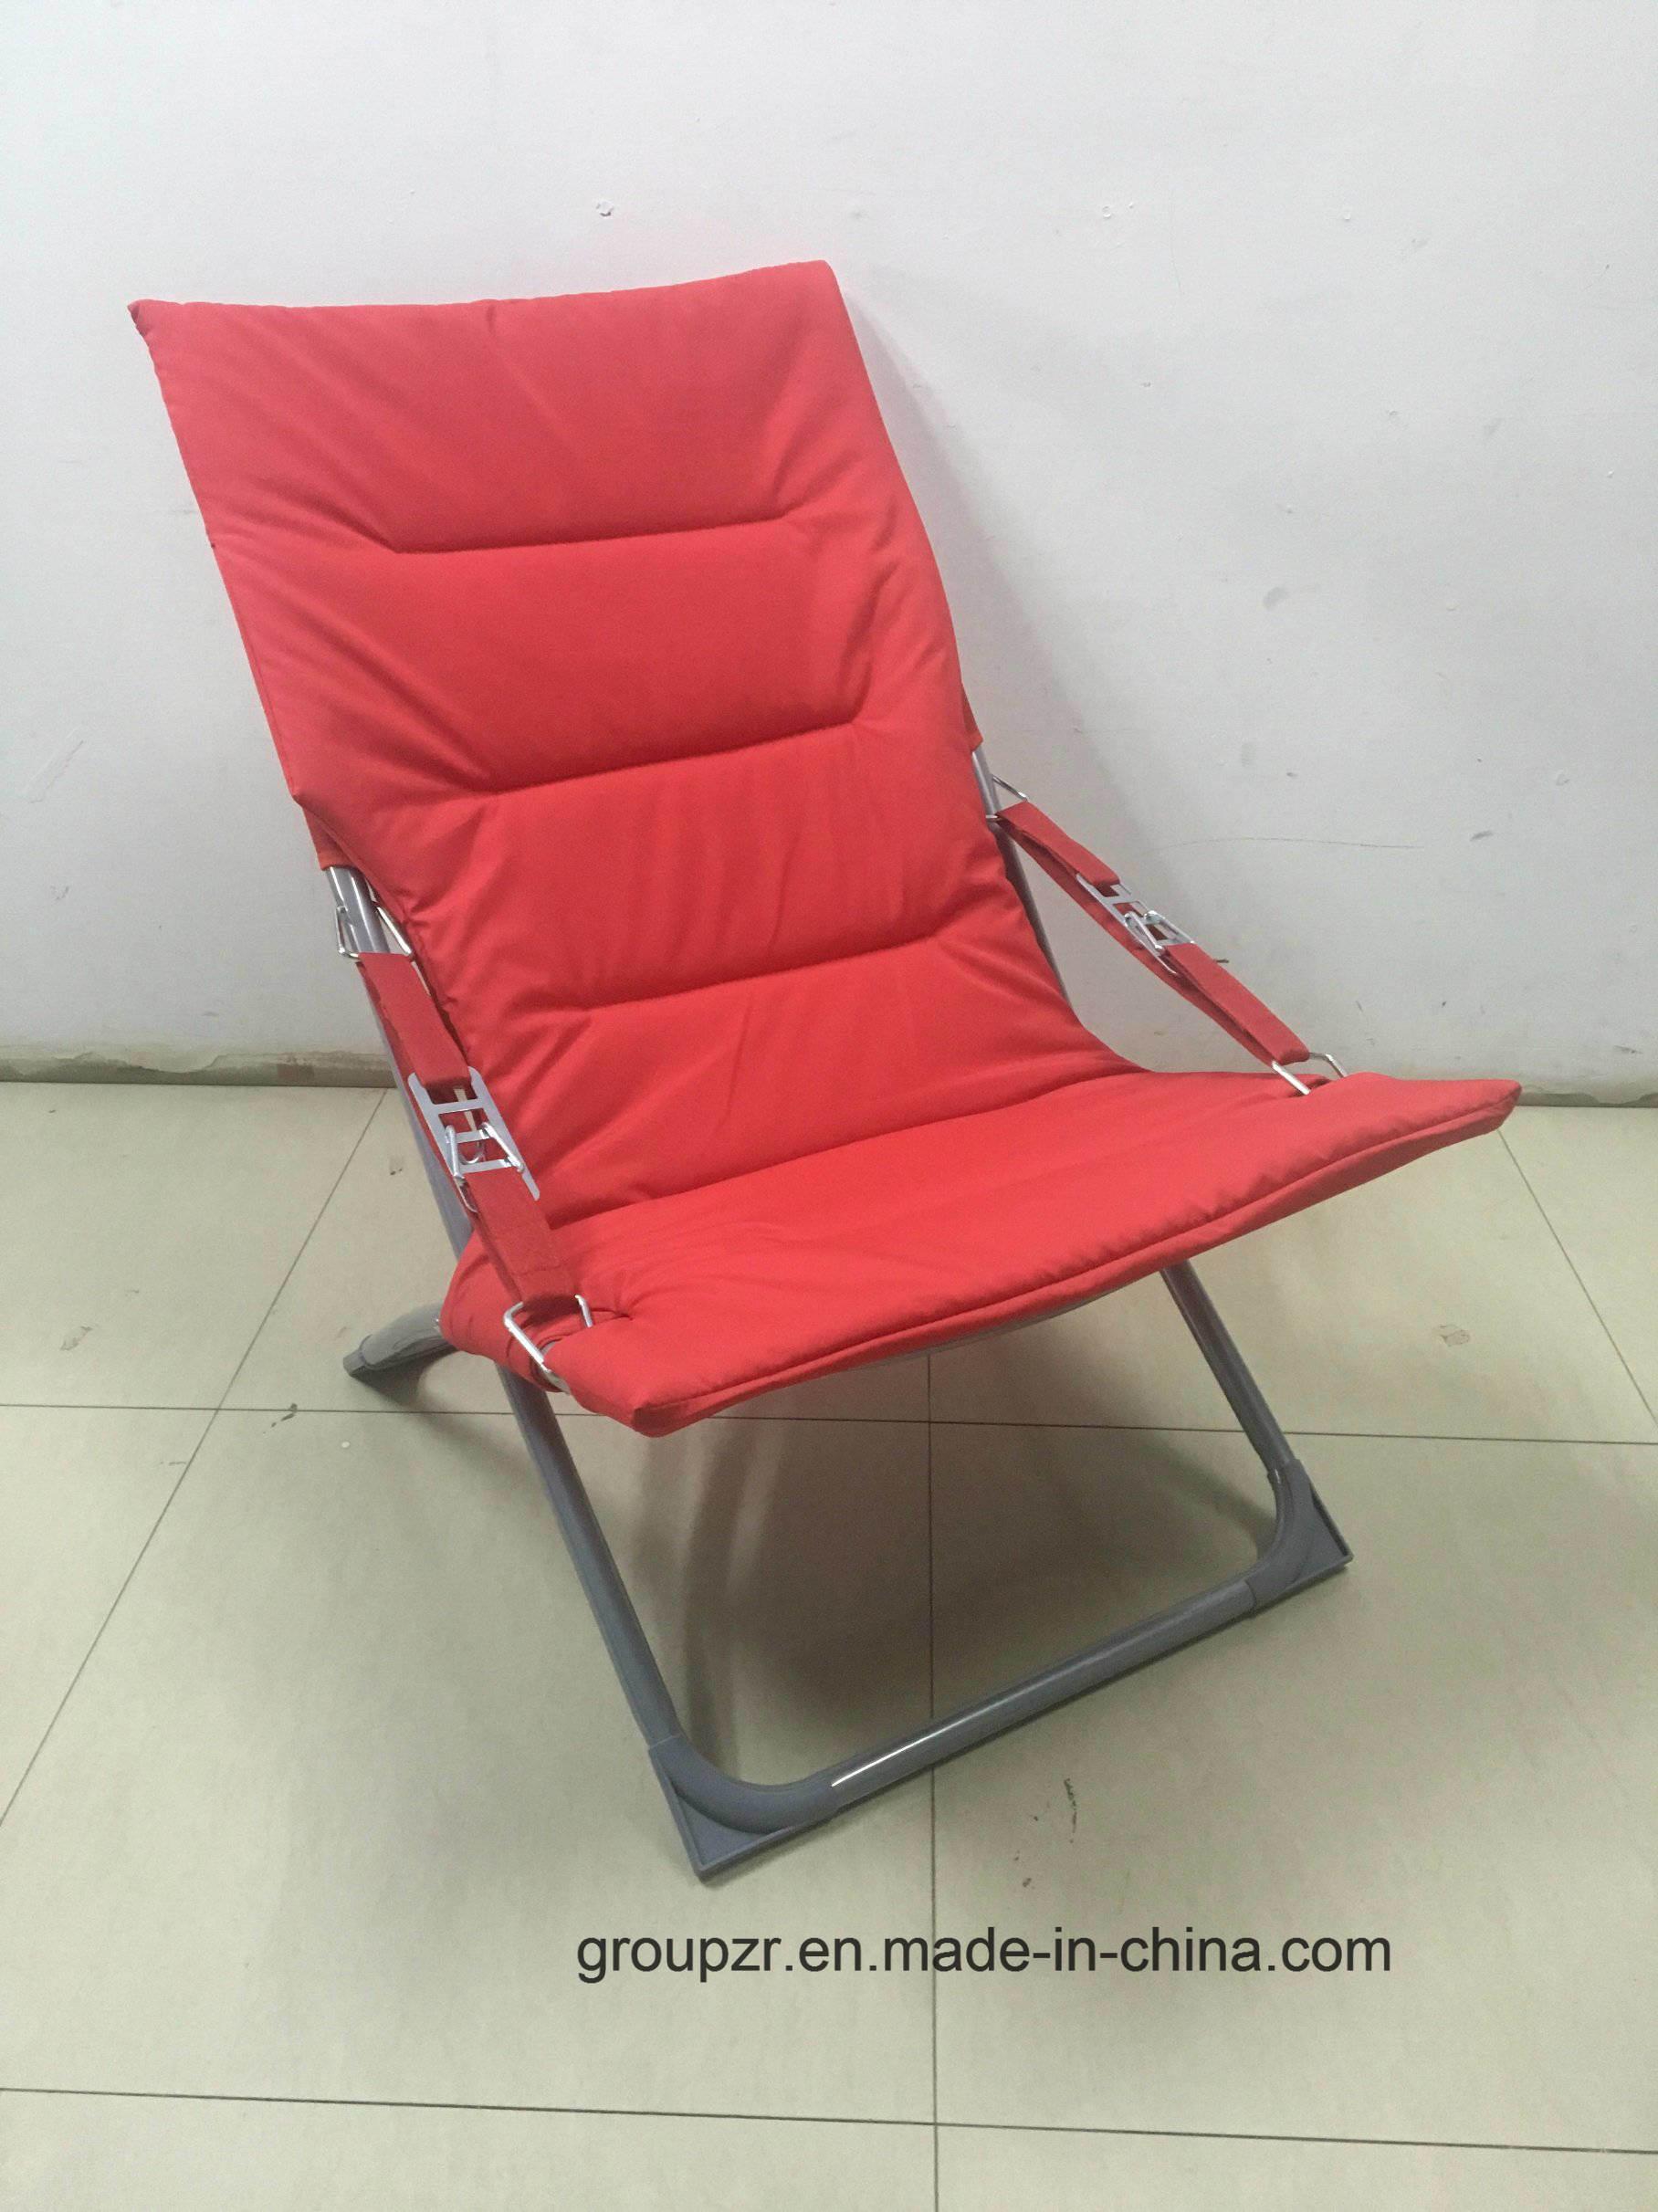 Outdoor Folding Beach Chair Camping Chair